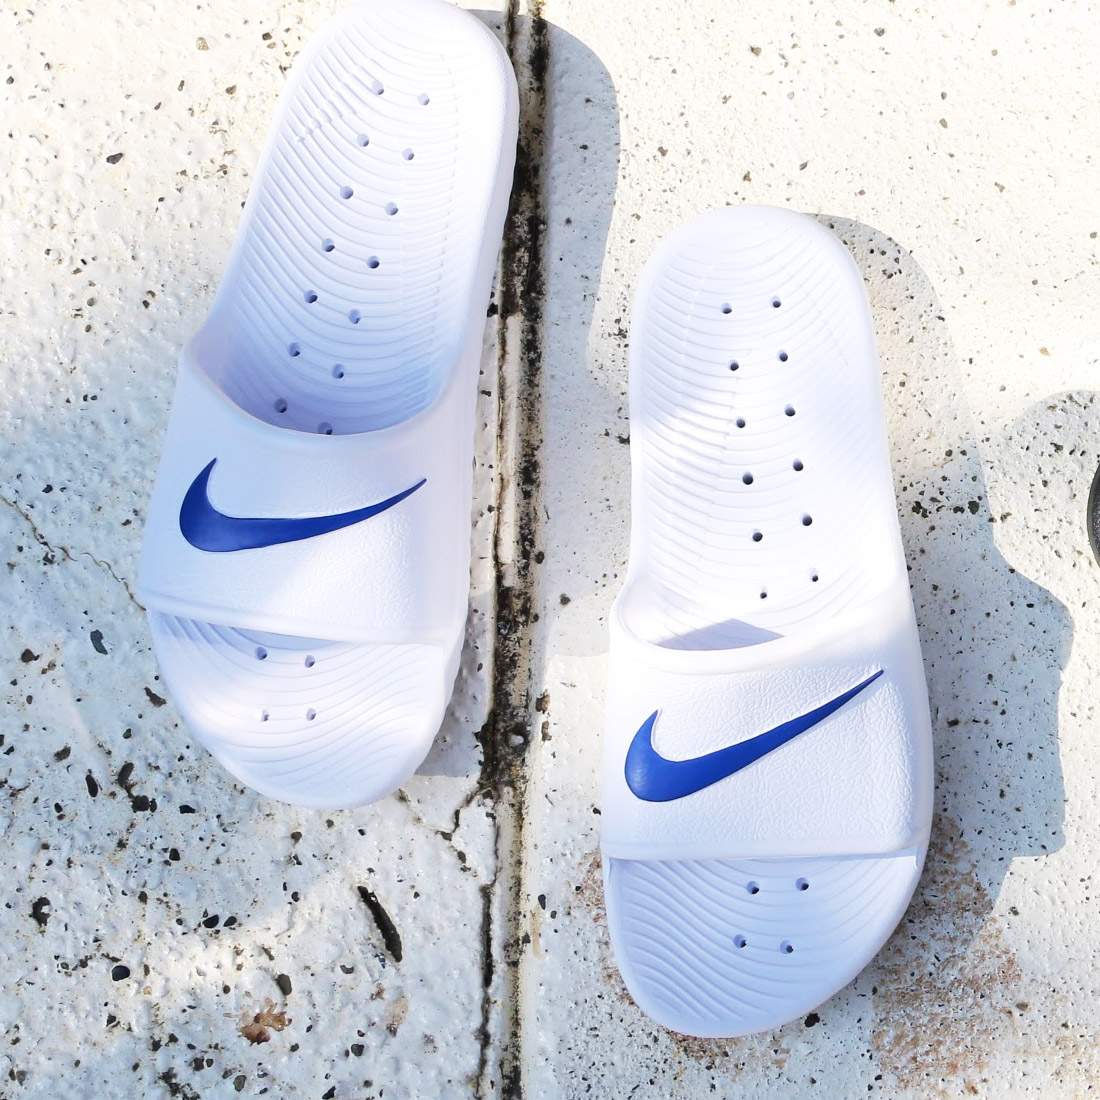 0473f54f9101c3 atmos pink  NIKE KAWA SHOWER (Nike kava shower) WHITE BLUE MOON 17SU ...